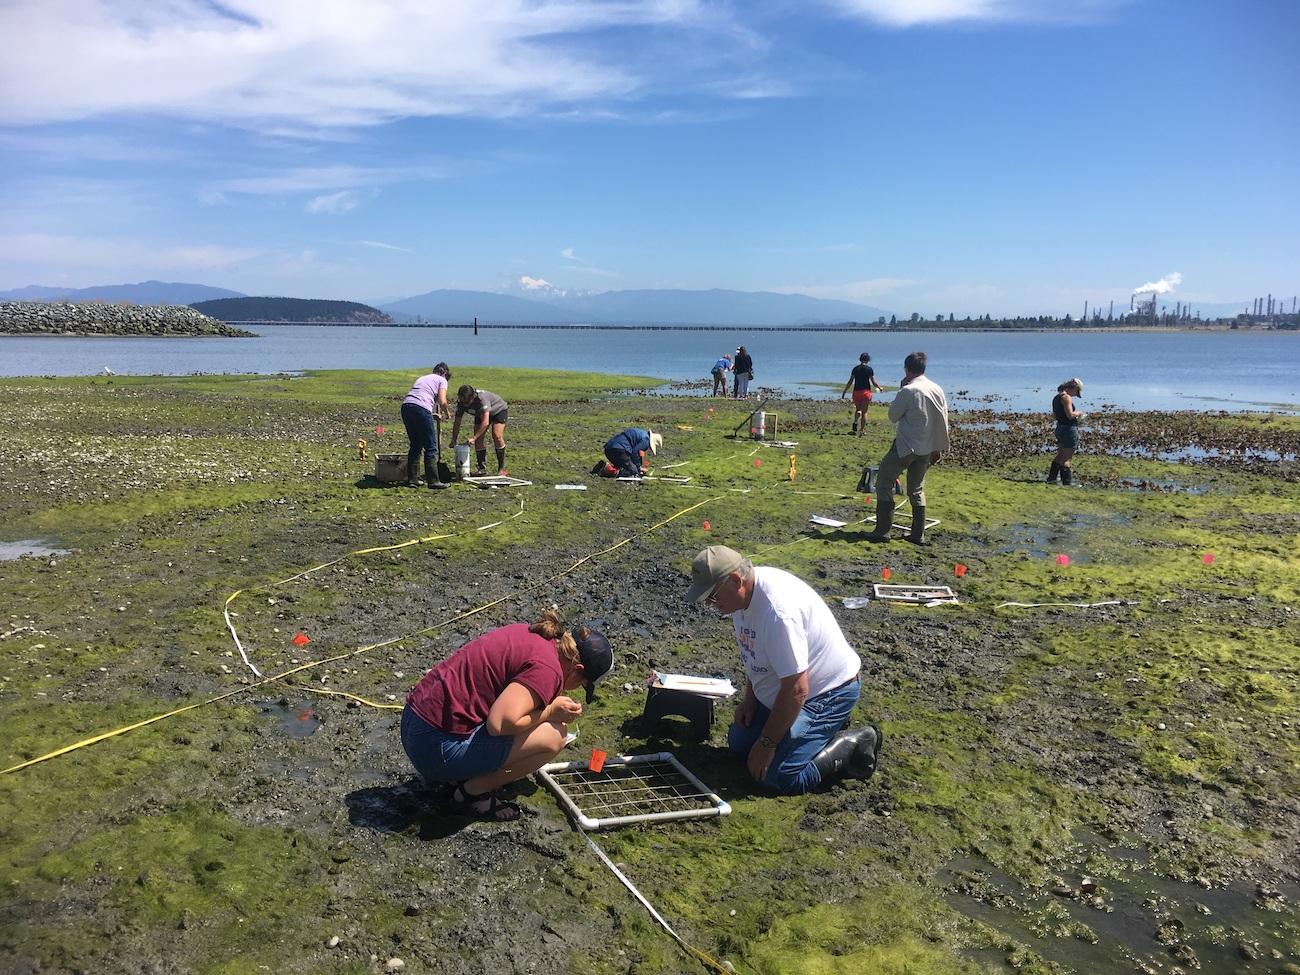 Fidalgo Bay Citizen's Stewardship Committee volunteers conduct intertidal monitoring surveys during low tide at Fidalgo Bay Aquatic Reserve. Photo: Erica Bleke/DNR